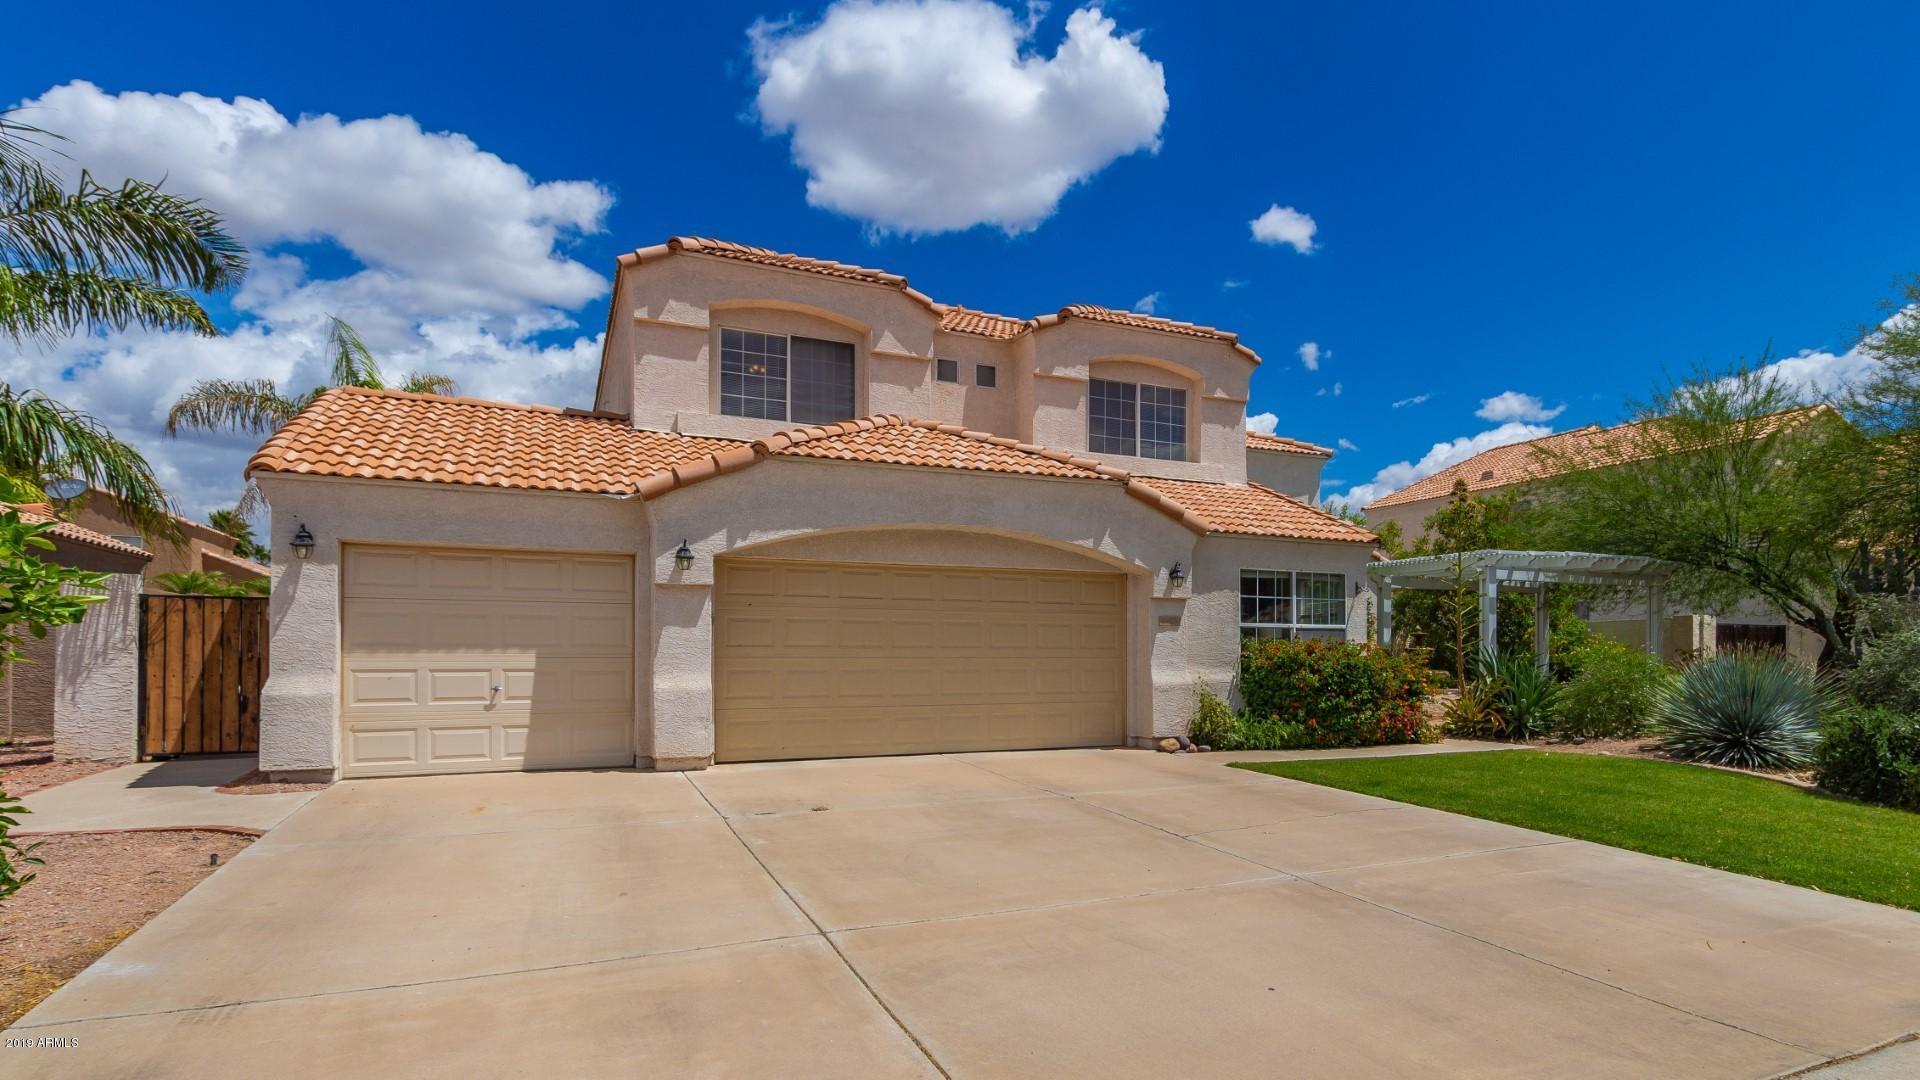 MLS 5926025 9458 E IMPALA Avenue, Mesa, AZ 85209 Mesa AZ Sierra Ranch